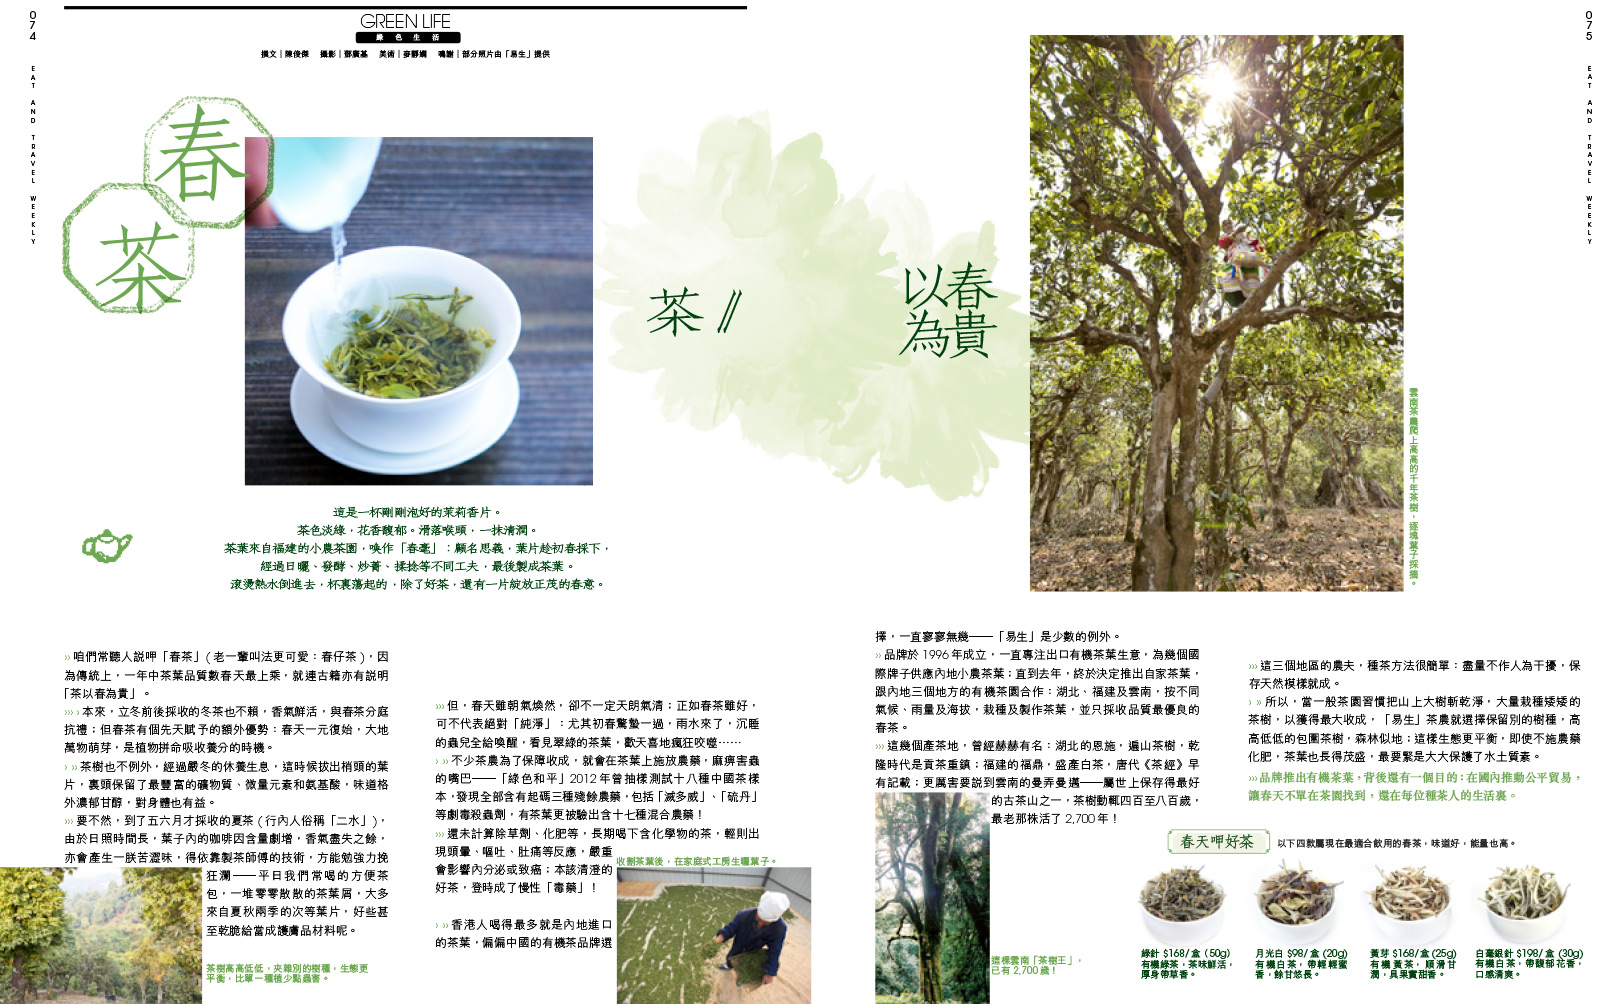 green-life-01.jpg